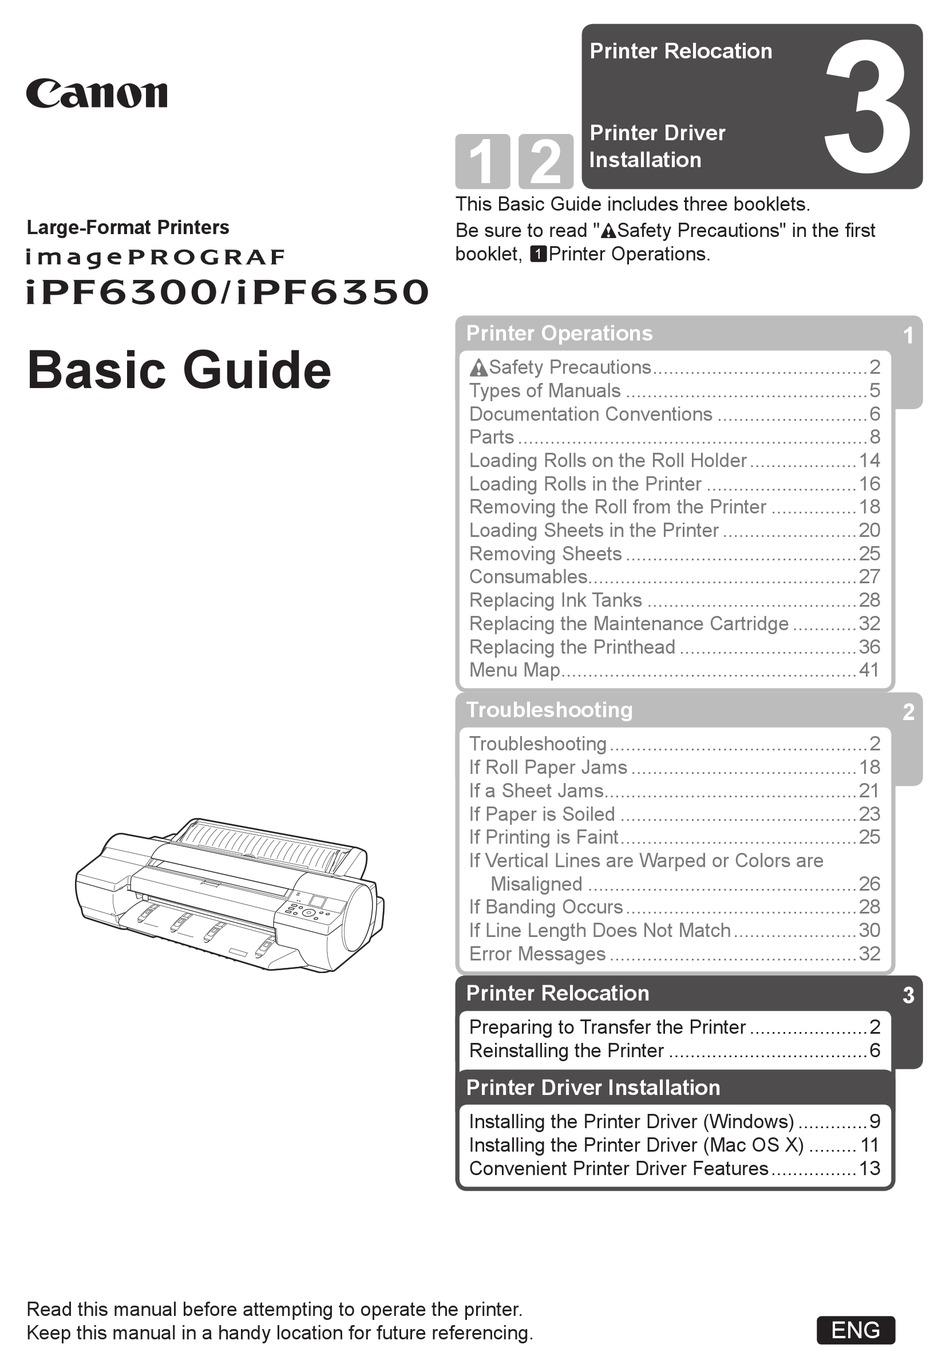 Electrical Basics Manual Guide